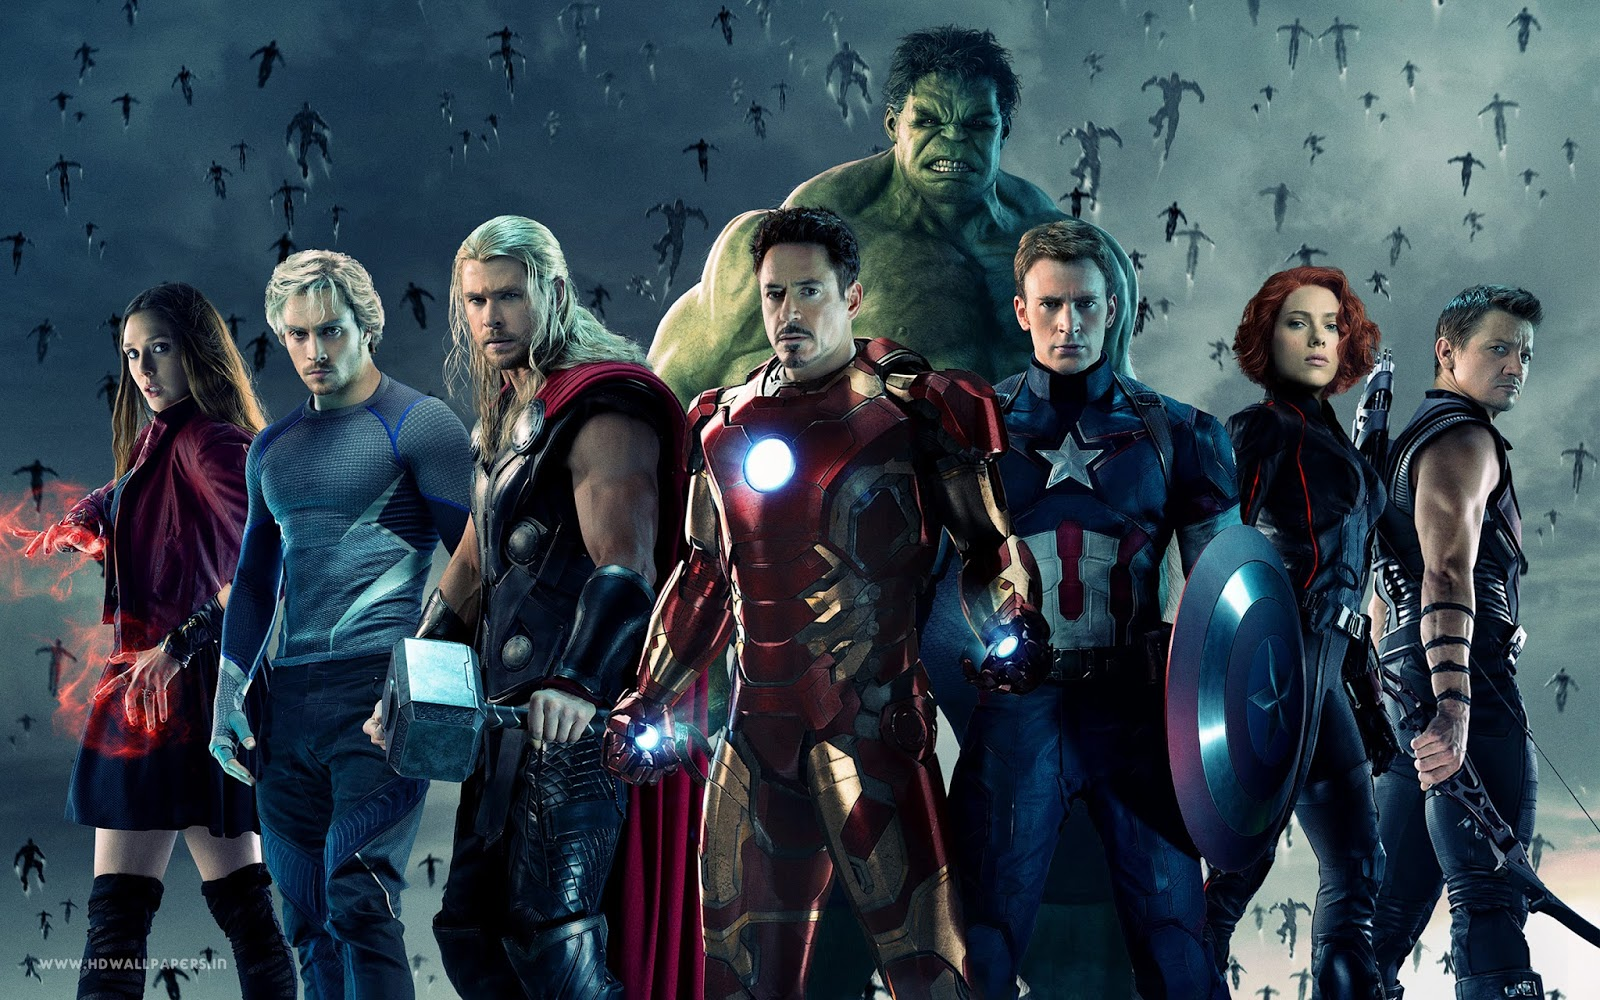 13 Karater yang muncul di Avengers: Age of Ultron